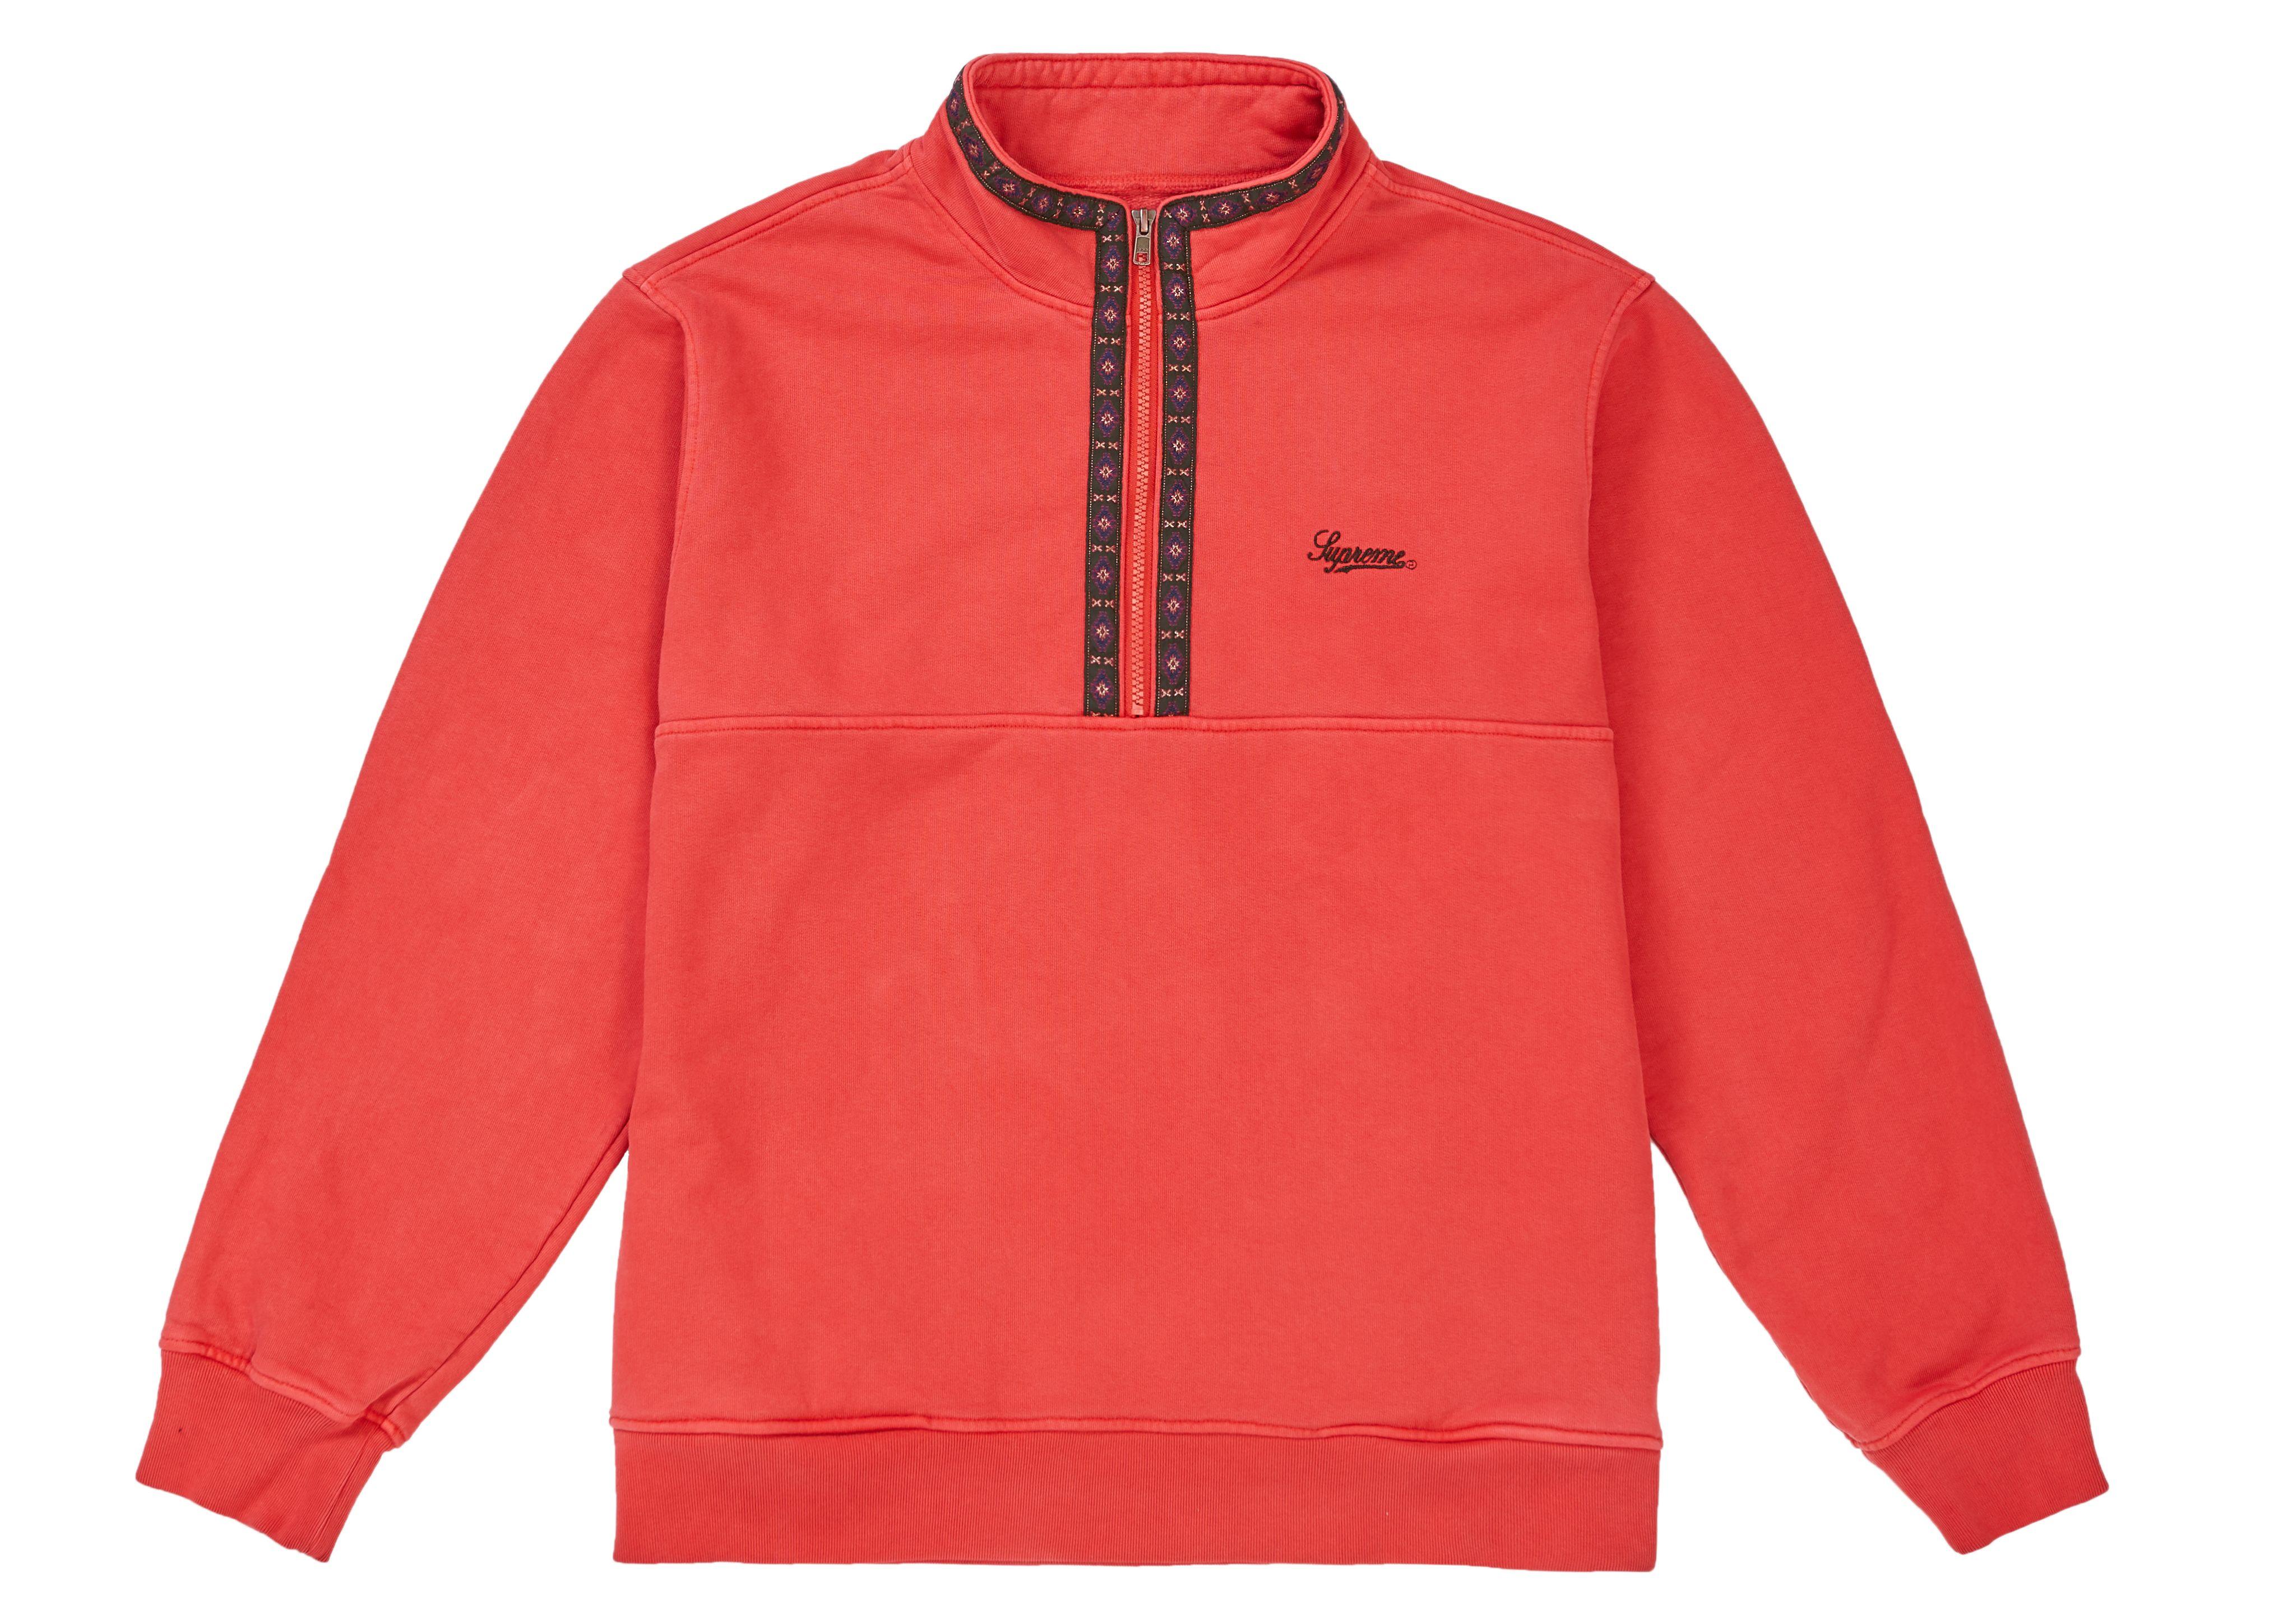 Supreme Overdyed Half Zip Sweatshirt Red (With images ...